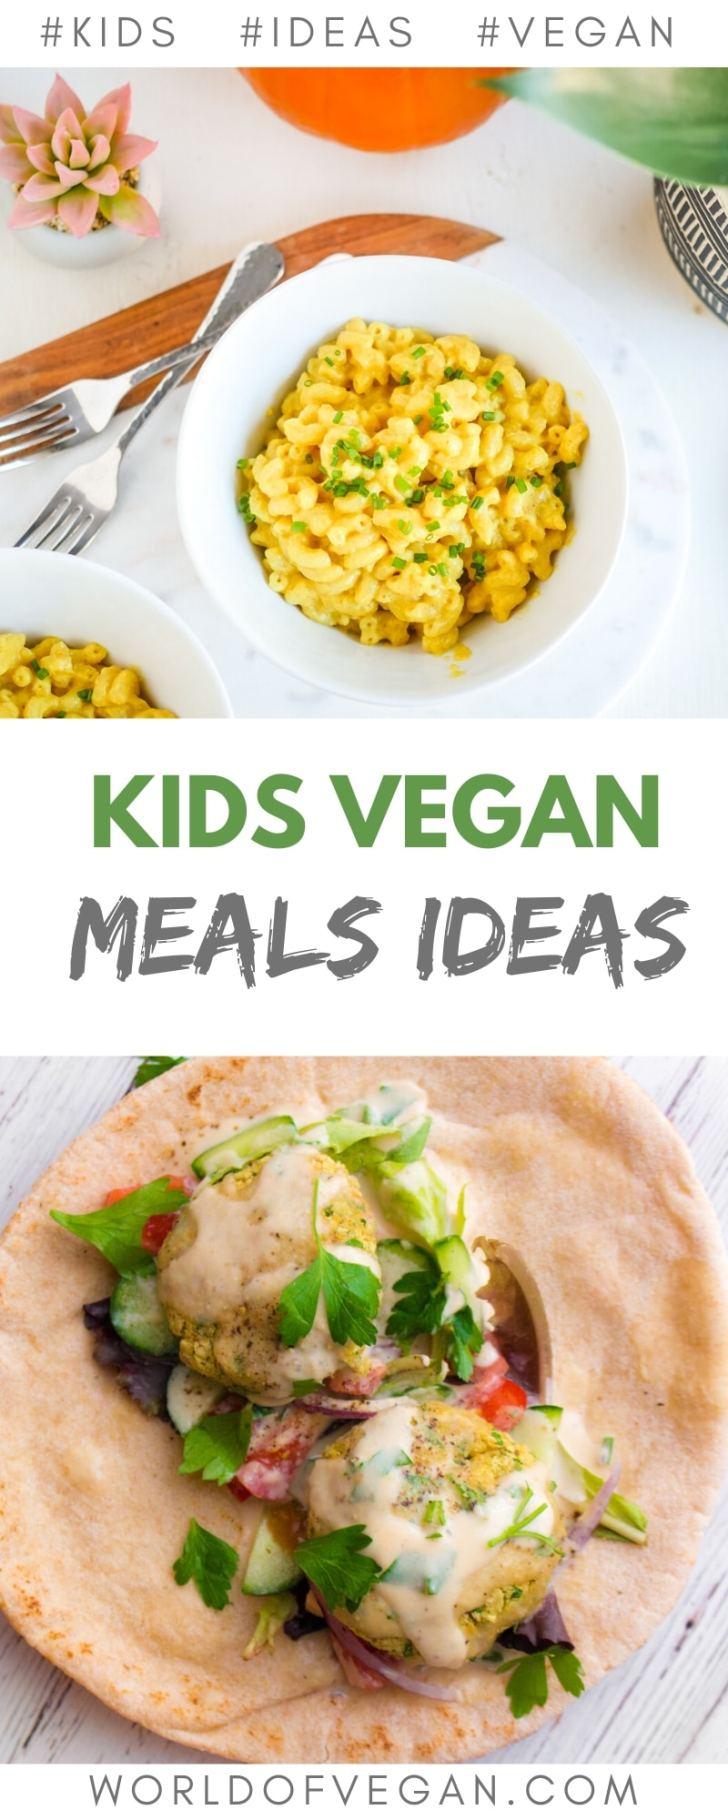 10 Vegan Meals Kids & Parents Will Love—Like Mac n Cheese! | World of Vegan | #kids #vegan #meals #recipe #ideas #easy #quick #macandcheese #wolrdofvegan